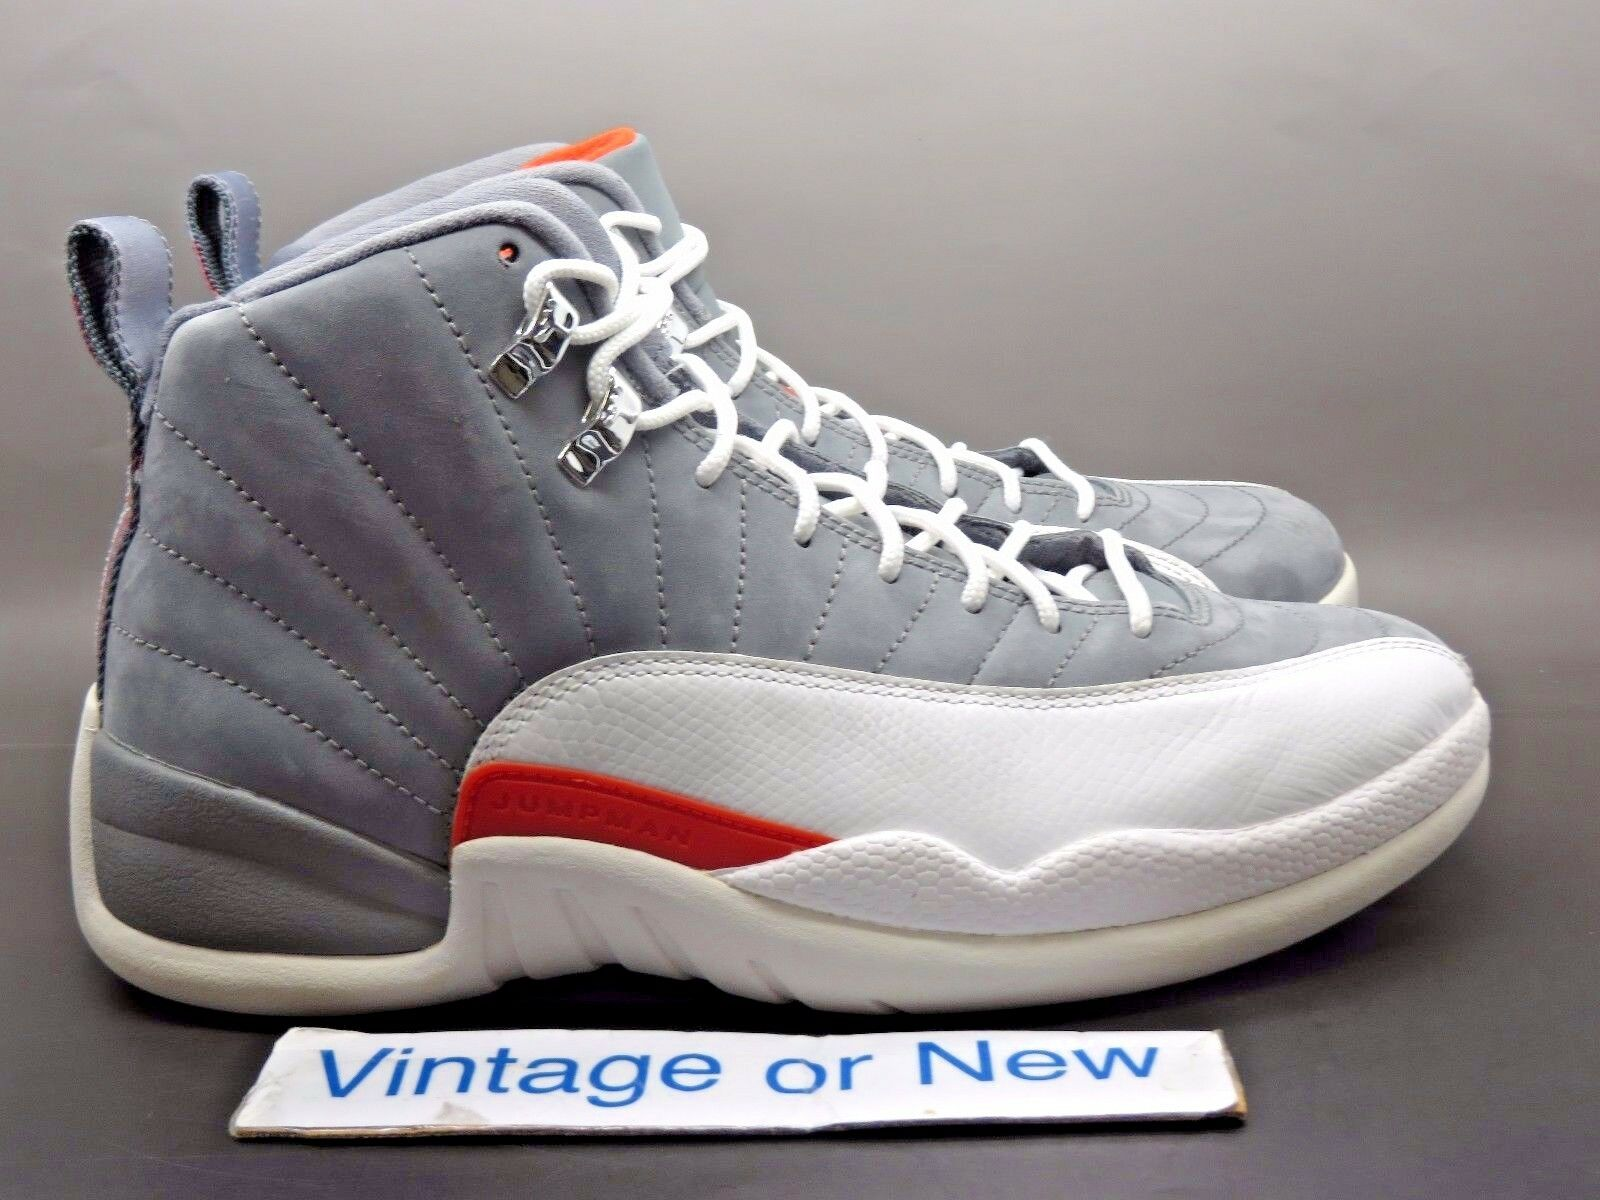 Air Jordan XII 12 Cool Grey Retro 2012 sz 8